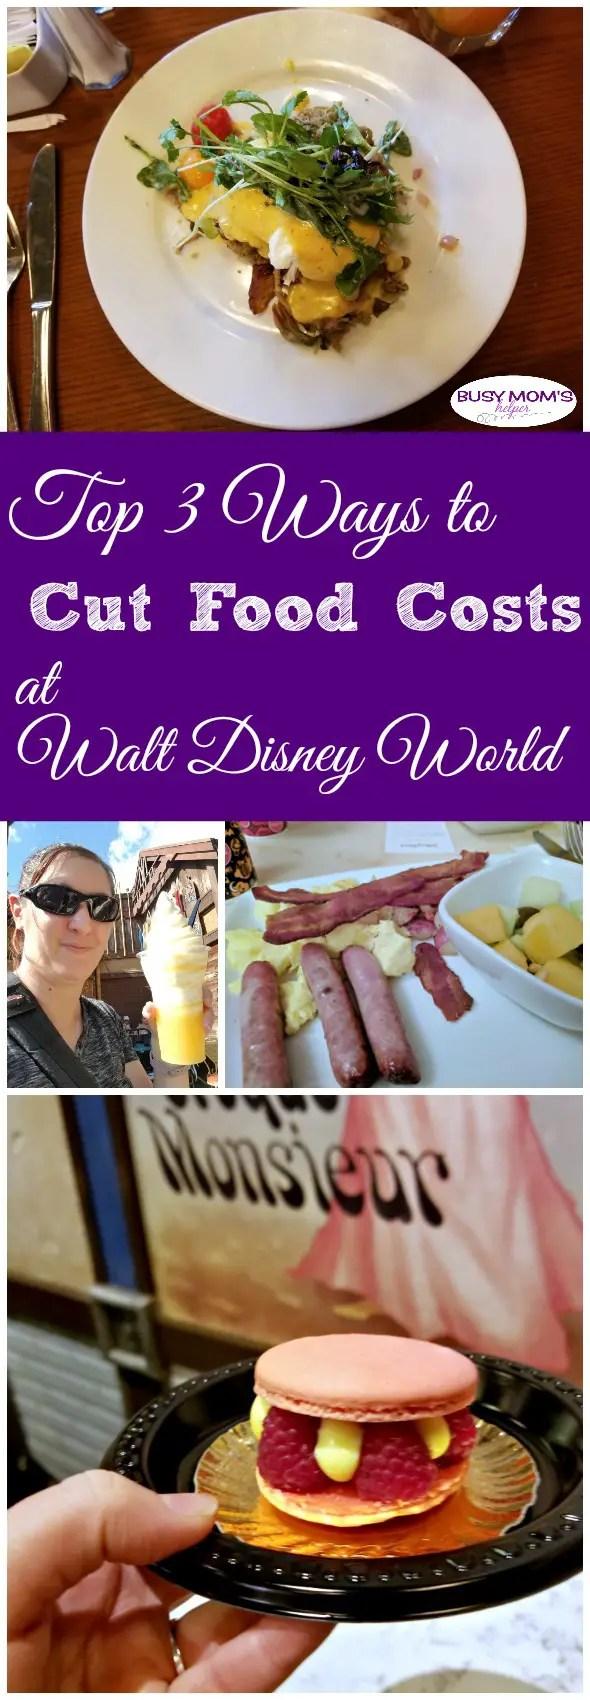 Top Tips to Cut Costs on Food at Walt Disney World - great ways to save money at Disney World! #wdw #waltdisneyworld #money #savingmoney #travel #familytravel #disney